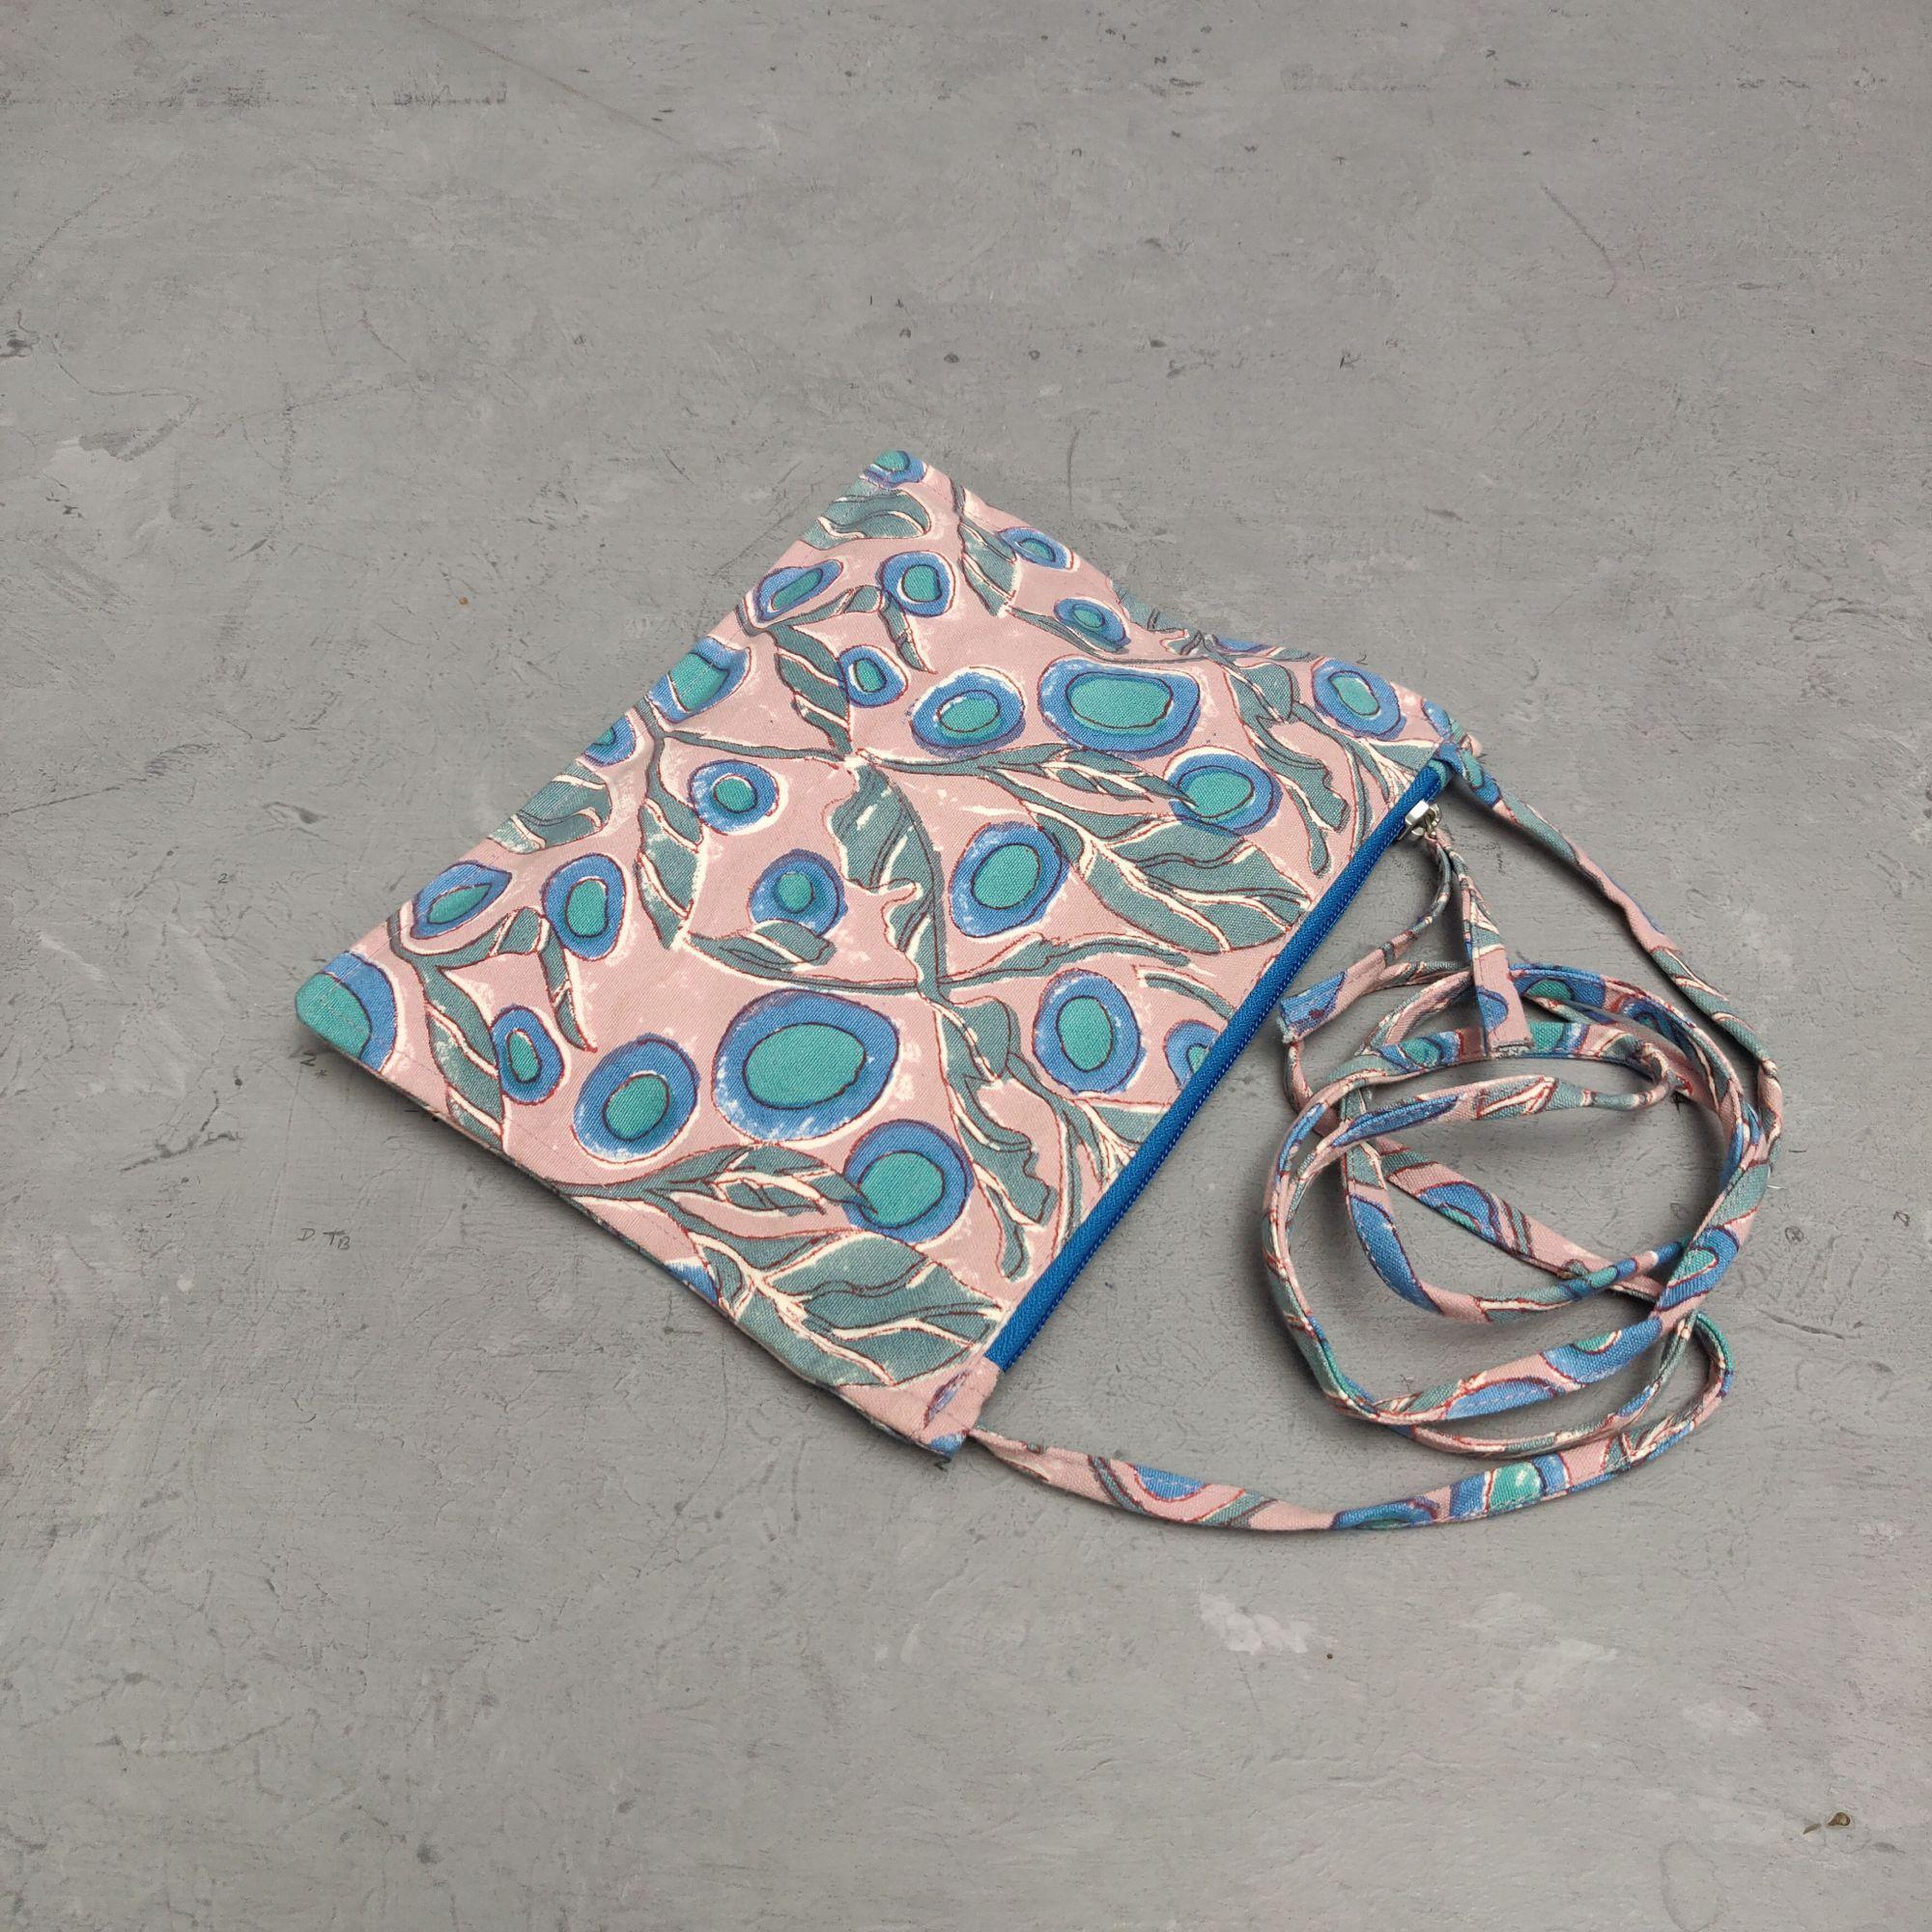 Peach Based Blue Motif Canvas Sling Bag